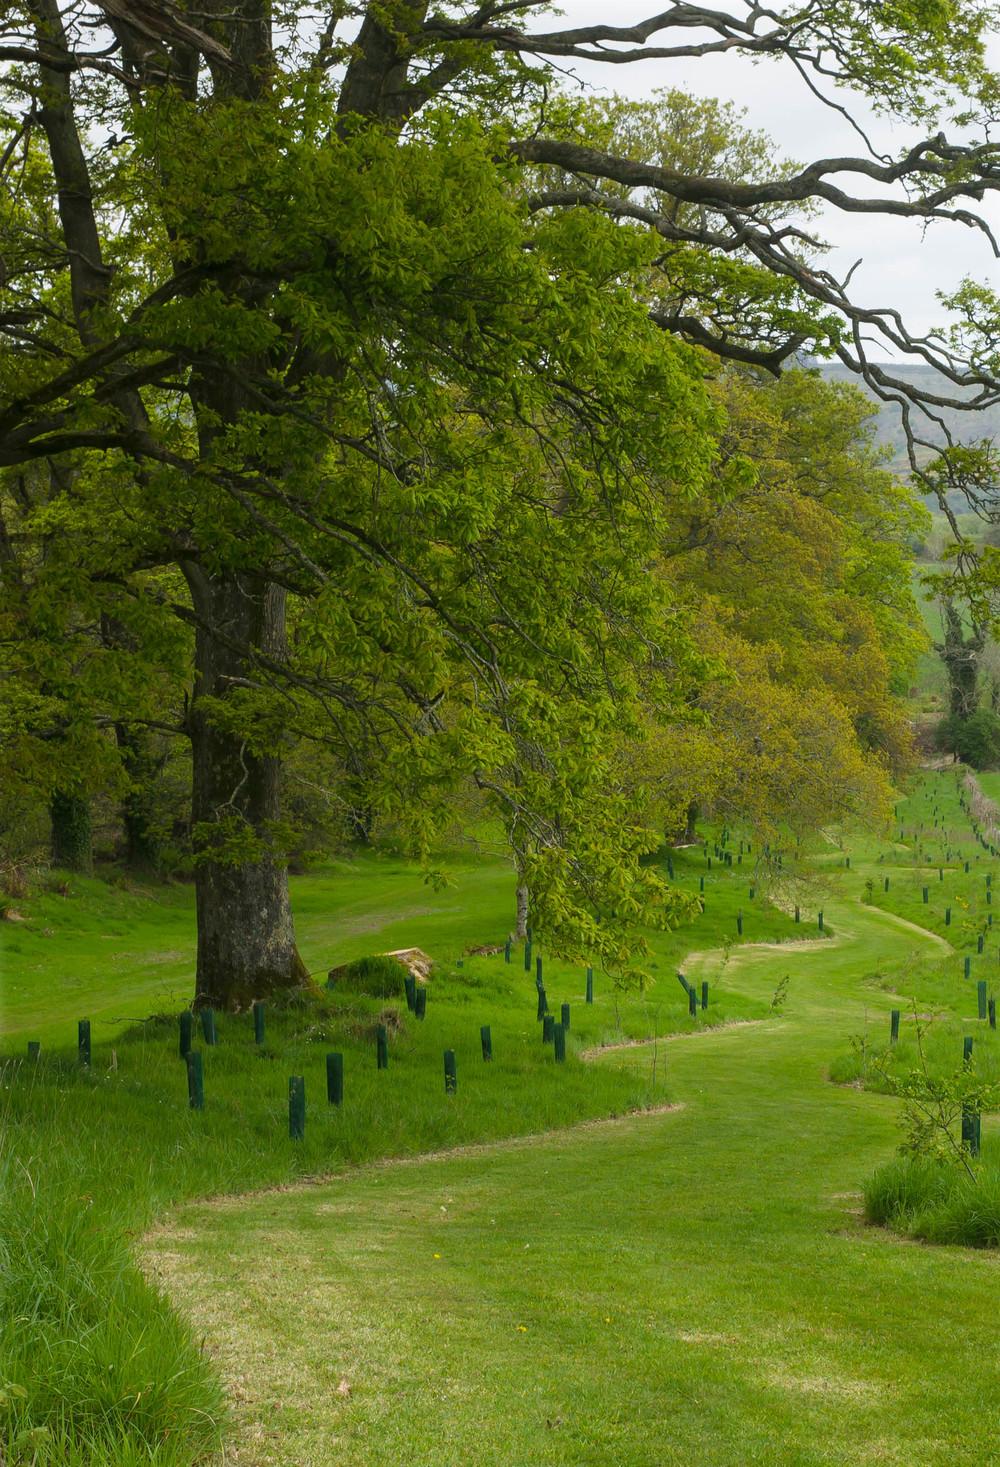 Kilmacurragh Arboretum May 2016 7 Tree Avenue 2 (1 of 1).jpg